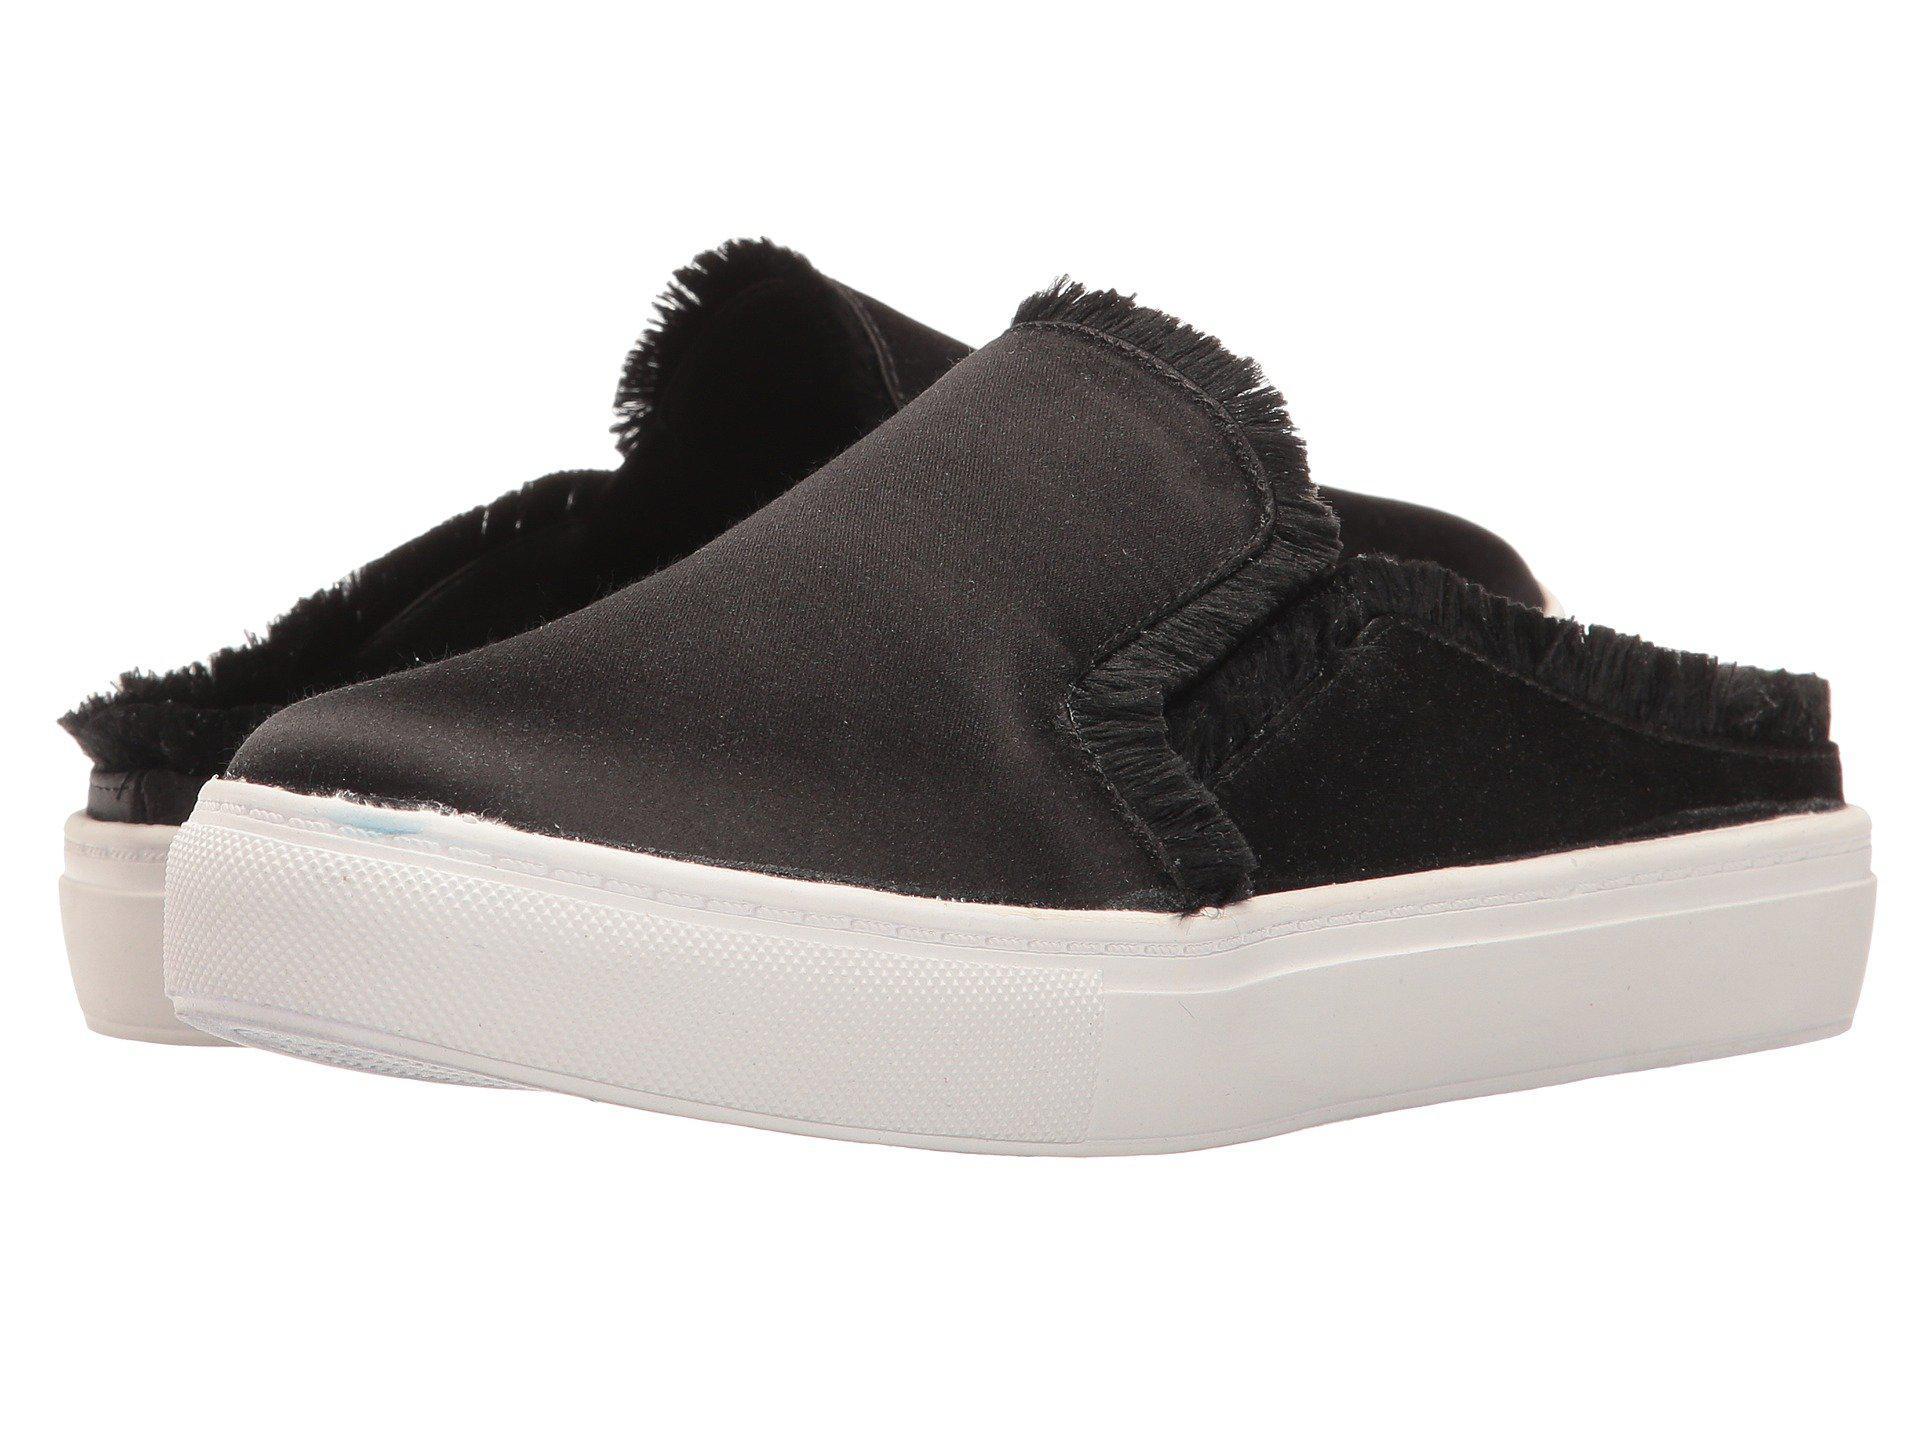 0cf8eafd8e8d45 Lyst - Dirty Laundry Jaxon Satin Mule Sneaker in Black - Save ...